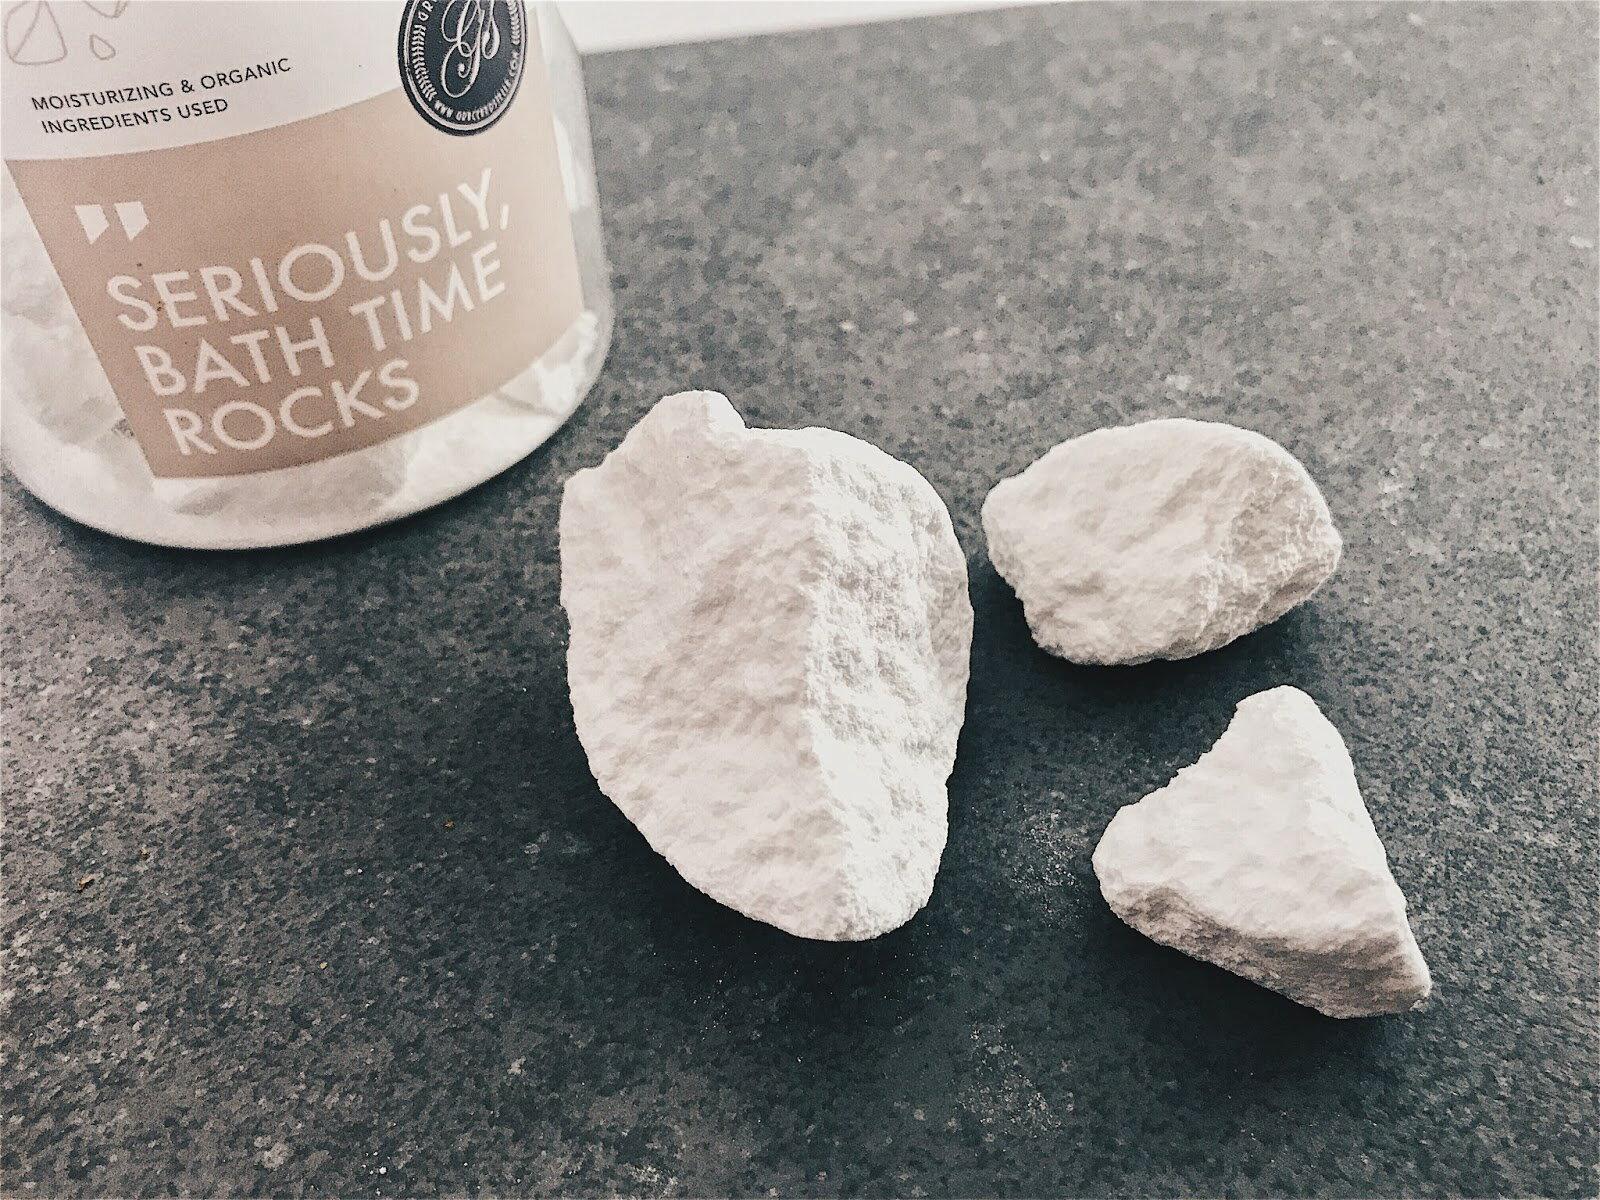 Bath Bomb Rocks (320g, Jasmine) by Grace & Stella Co. 2